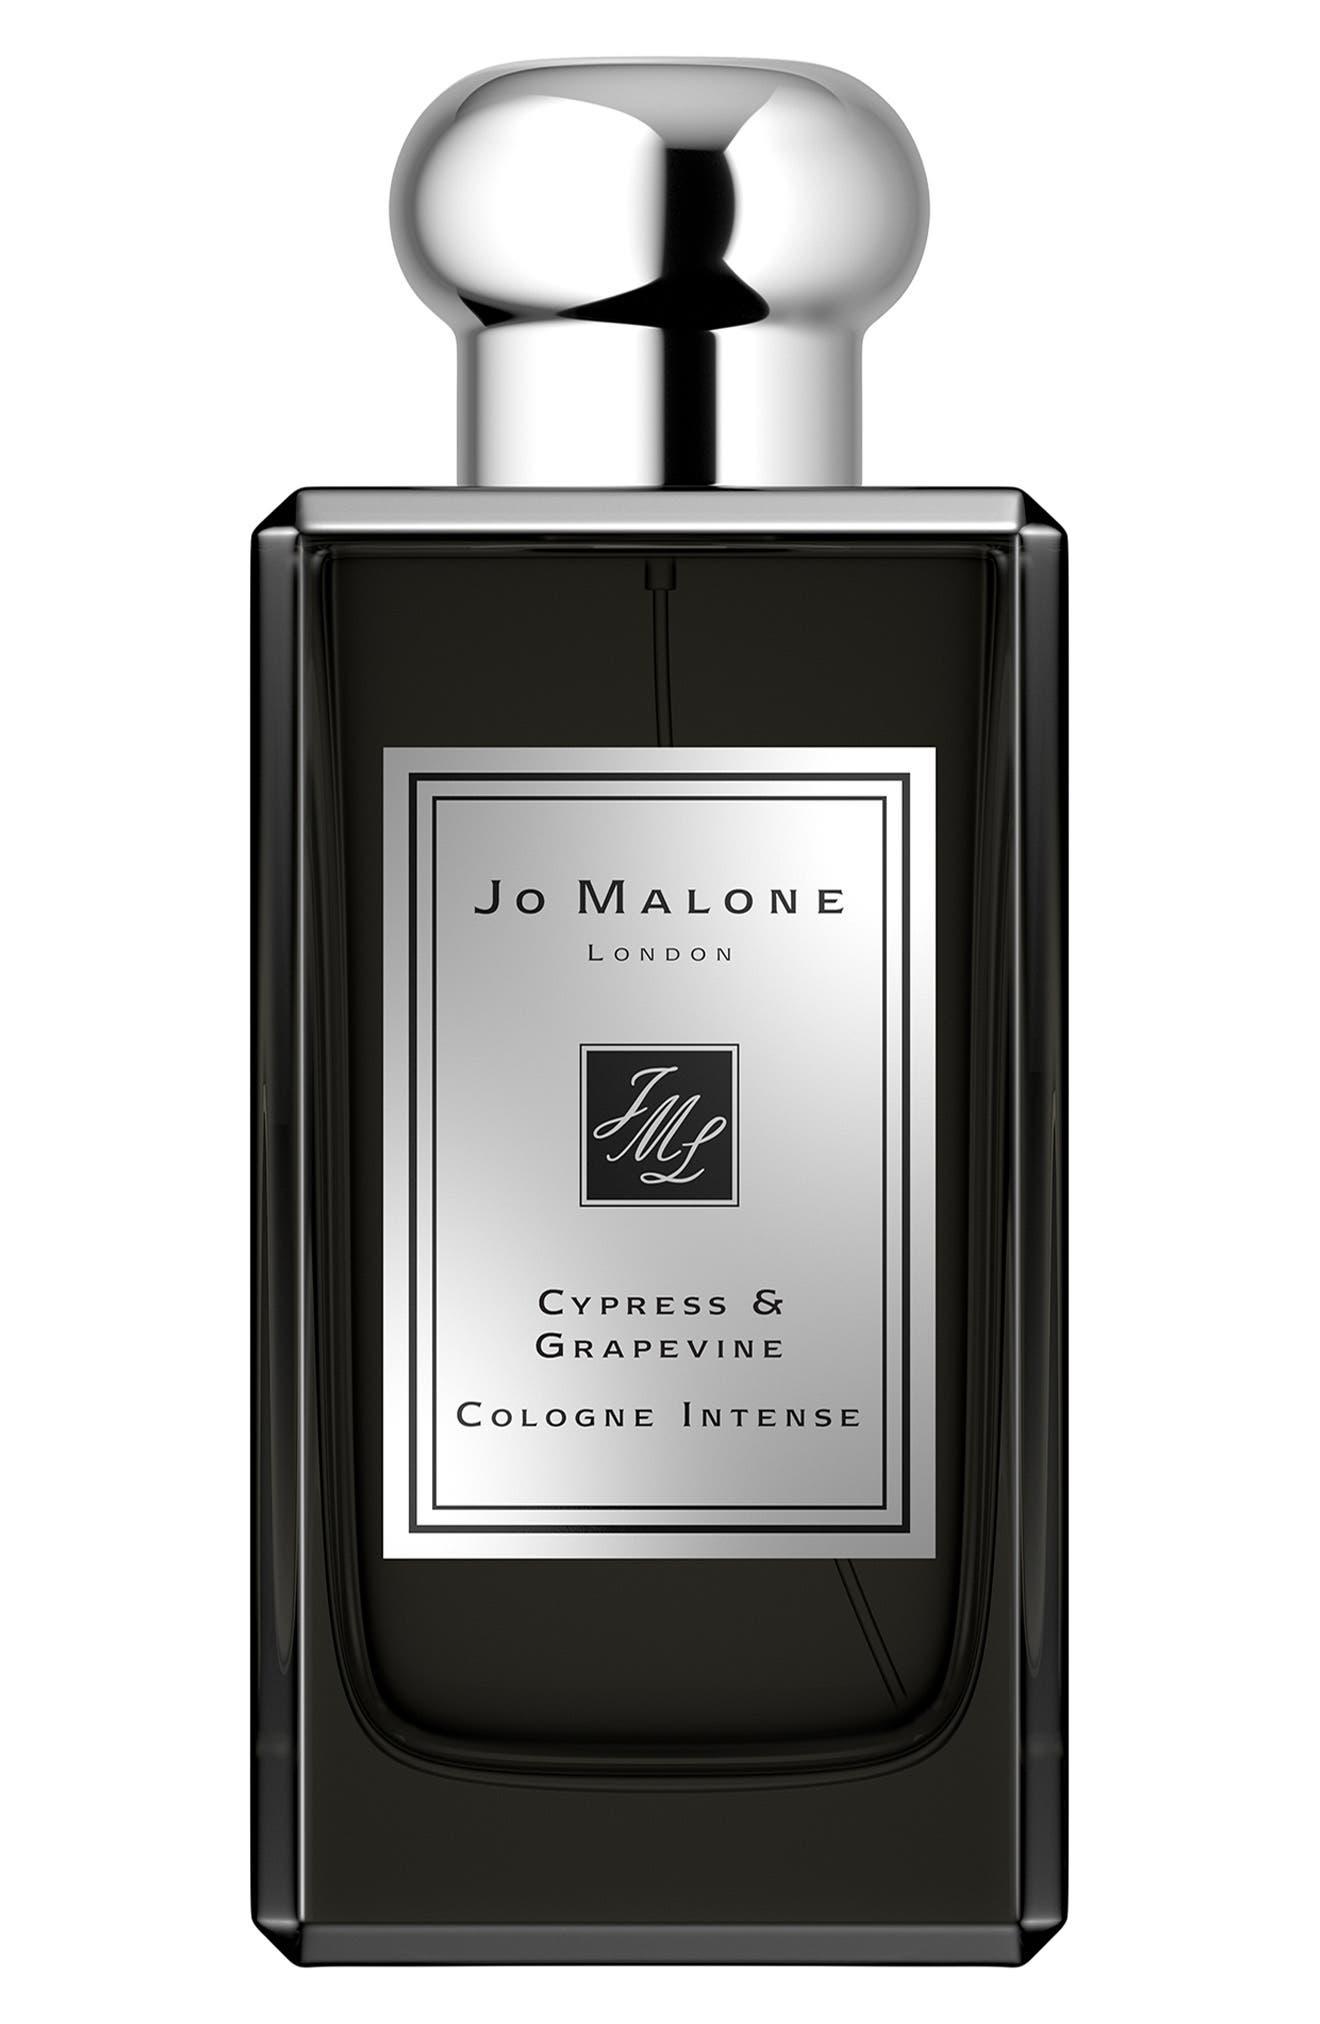 Jo Malone London(TM) Cypress And Grapevine Cologne